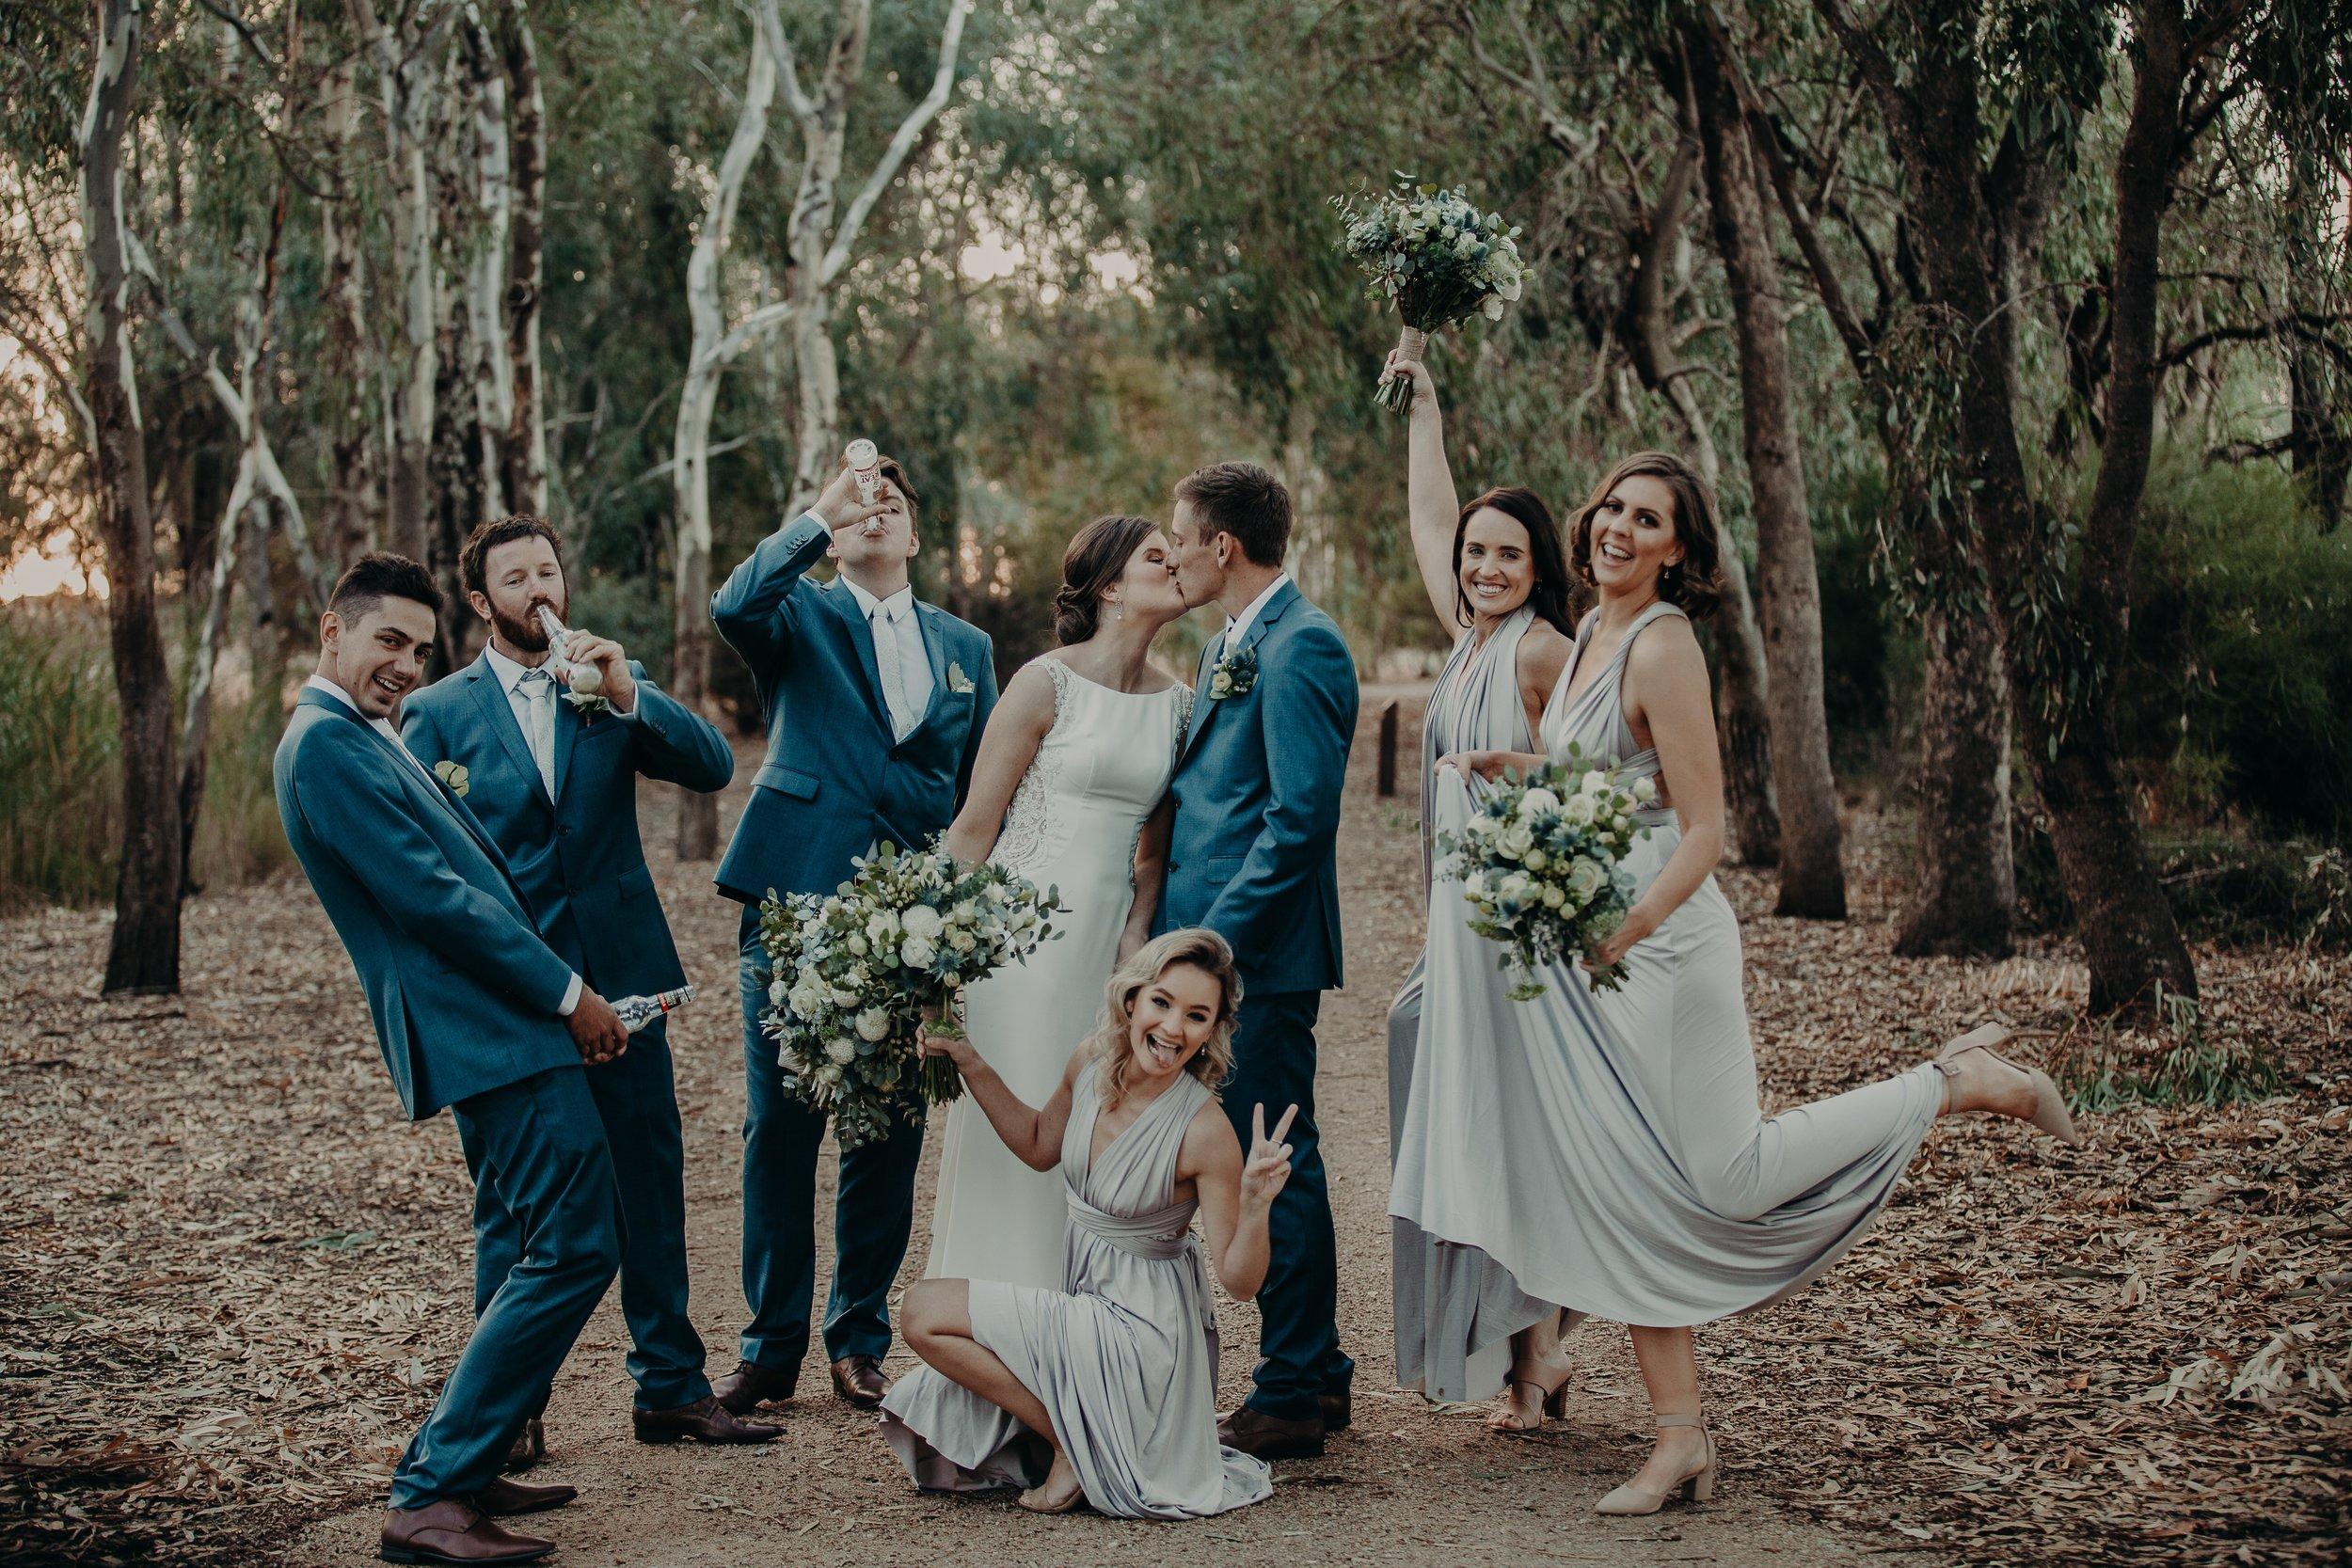 mickalathomas_puremacphotography_weddingphotographer_couplephotographer_Sheppartonphotographer_2557.jpg